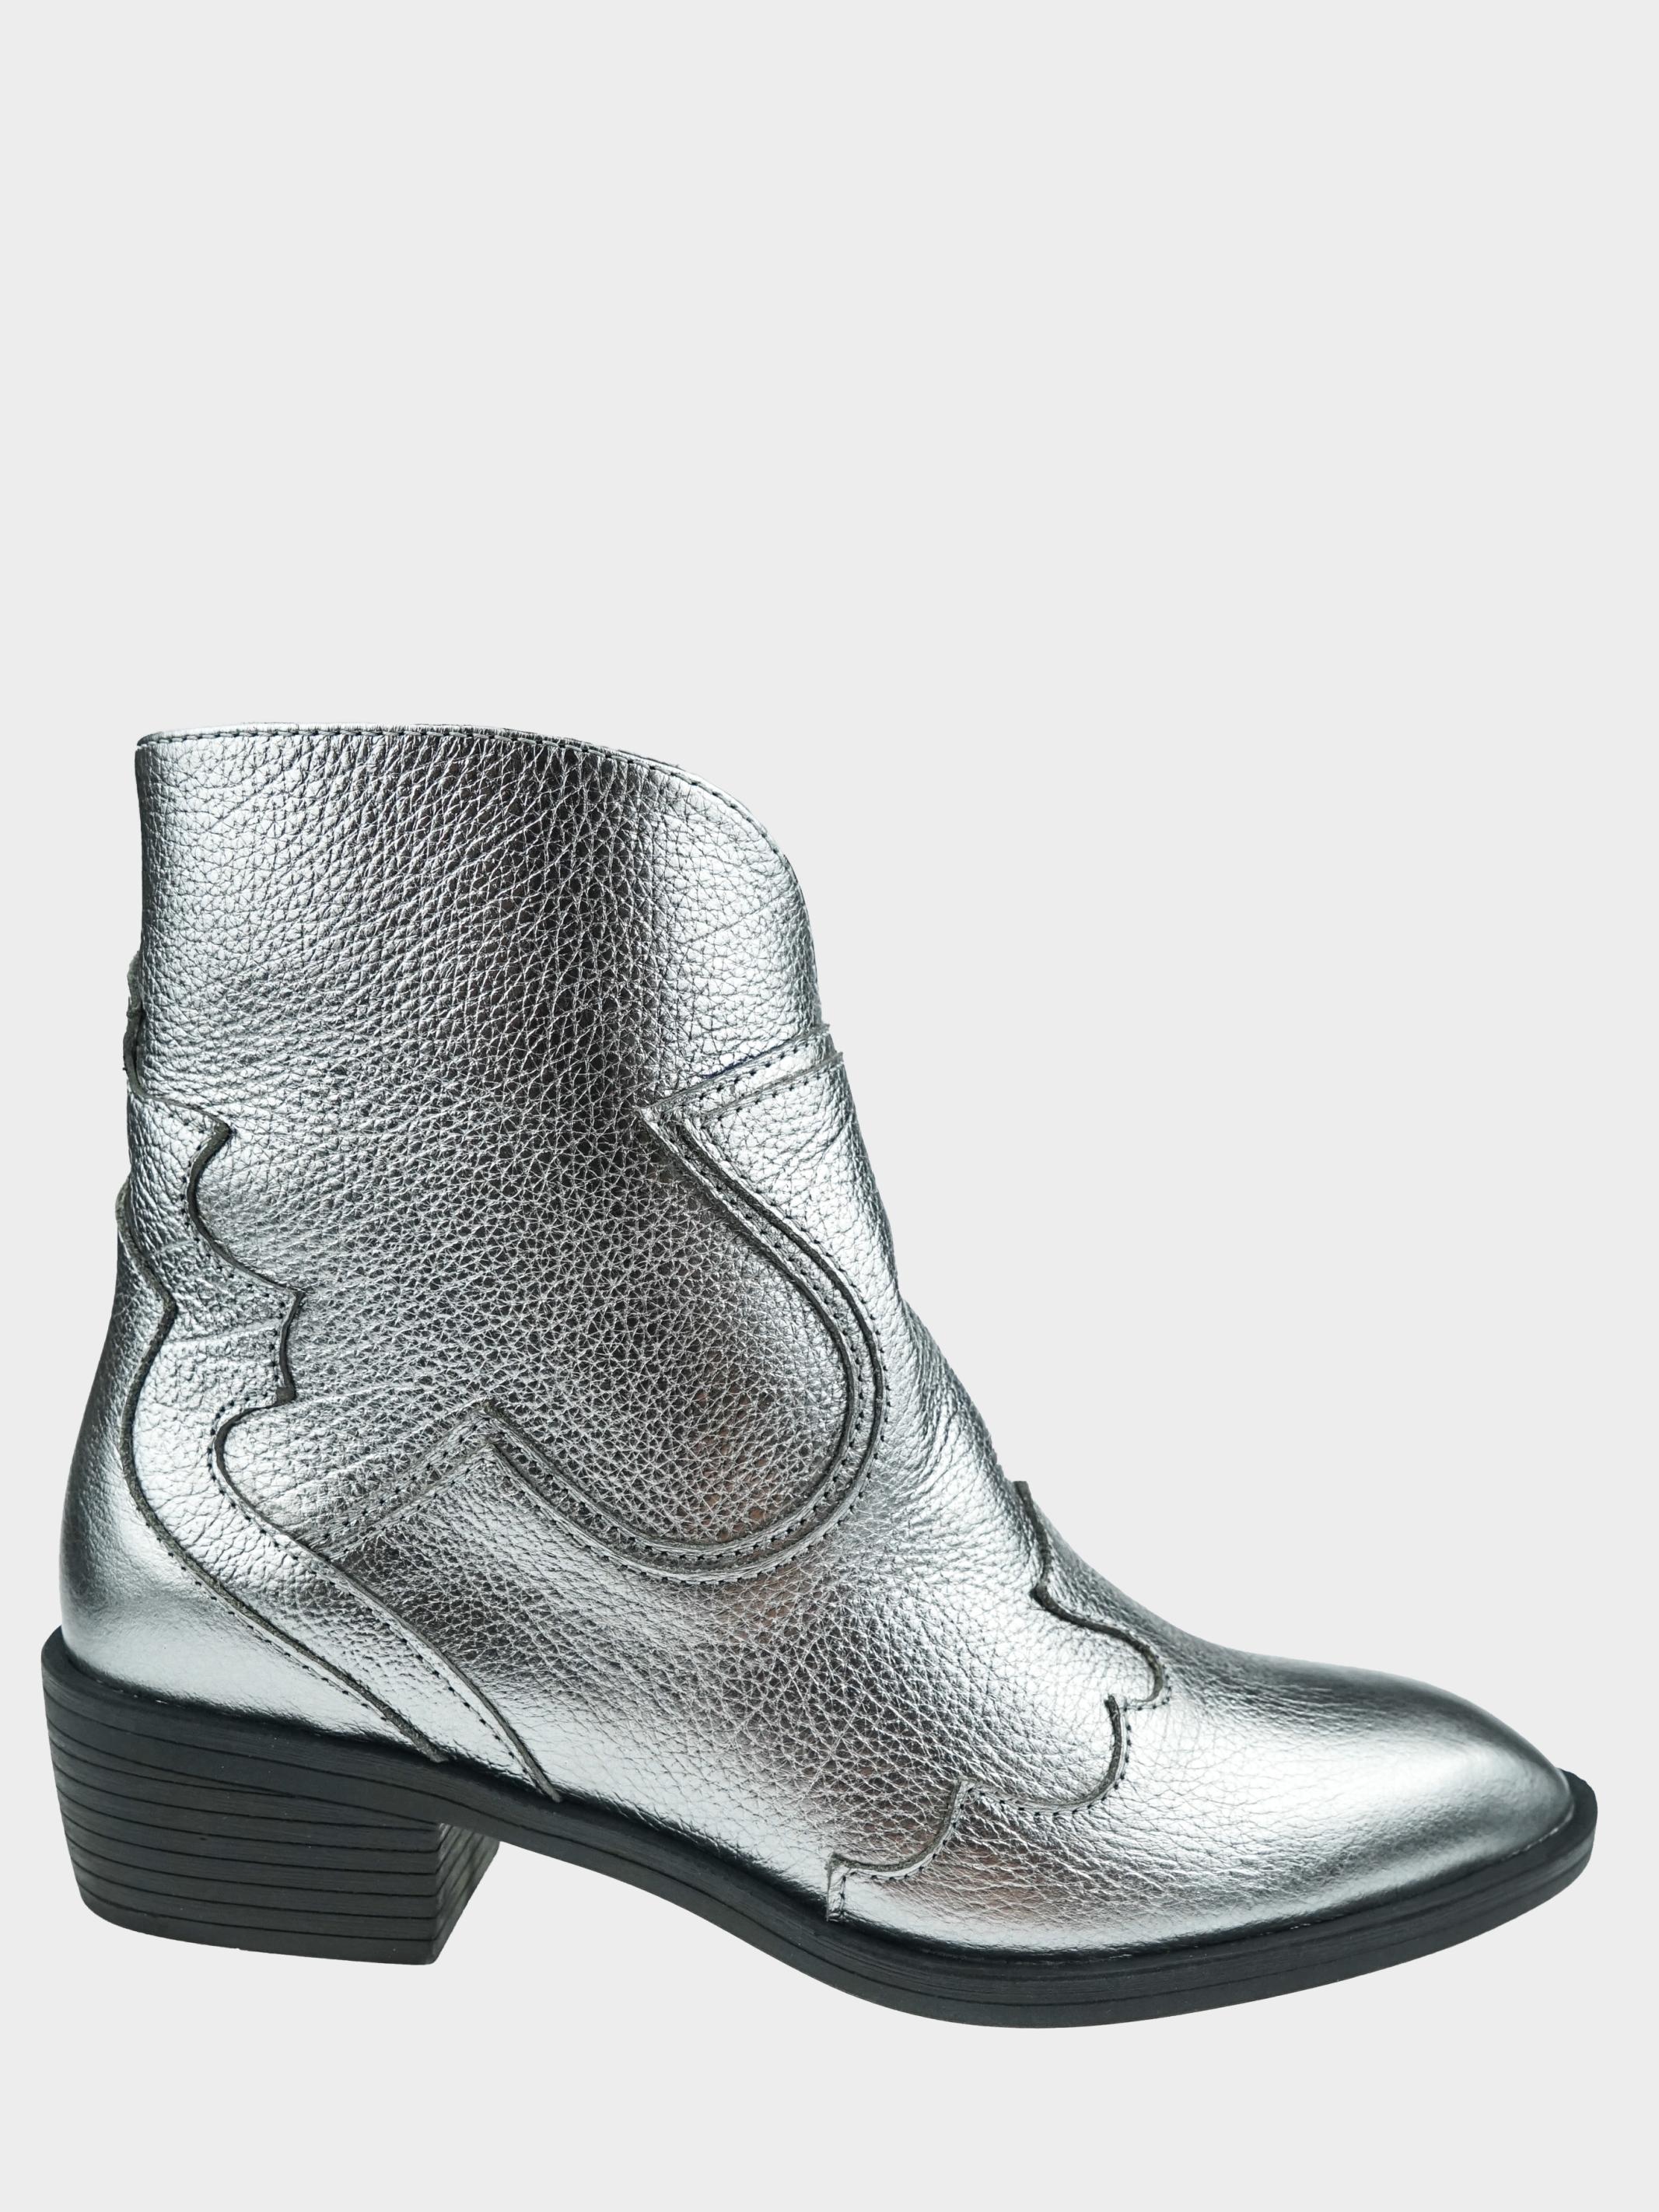 Ботинки женские Казаки Lo1524-75 Lo1524-75 размеры обуви, 2017